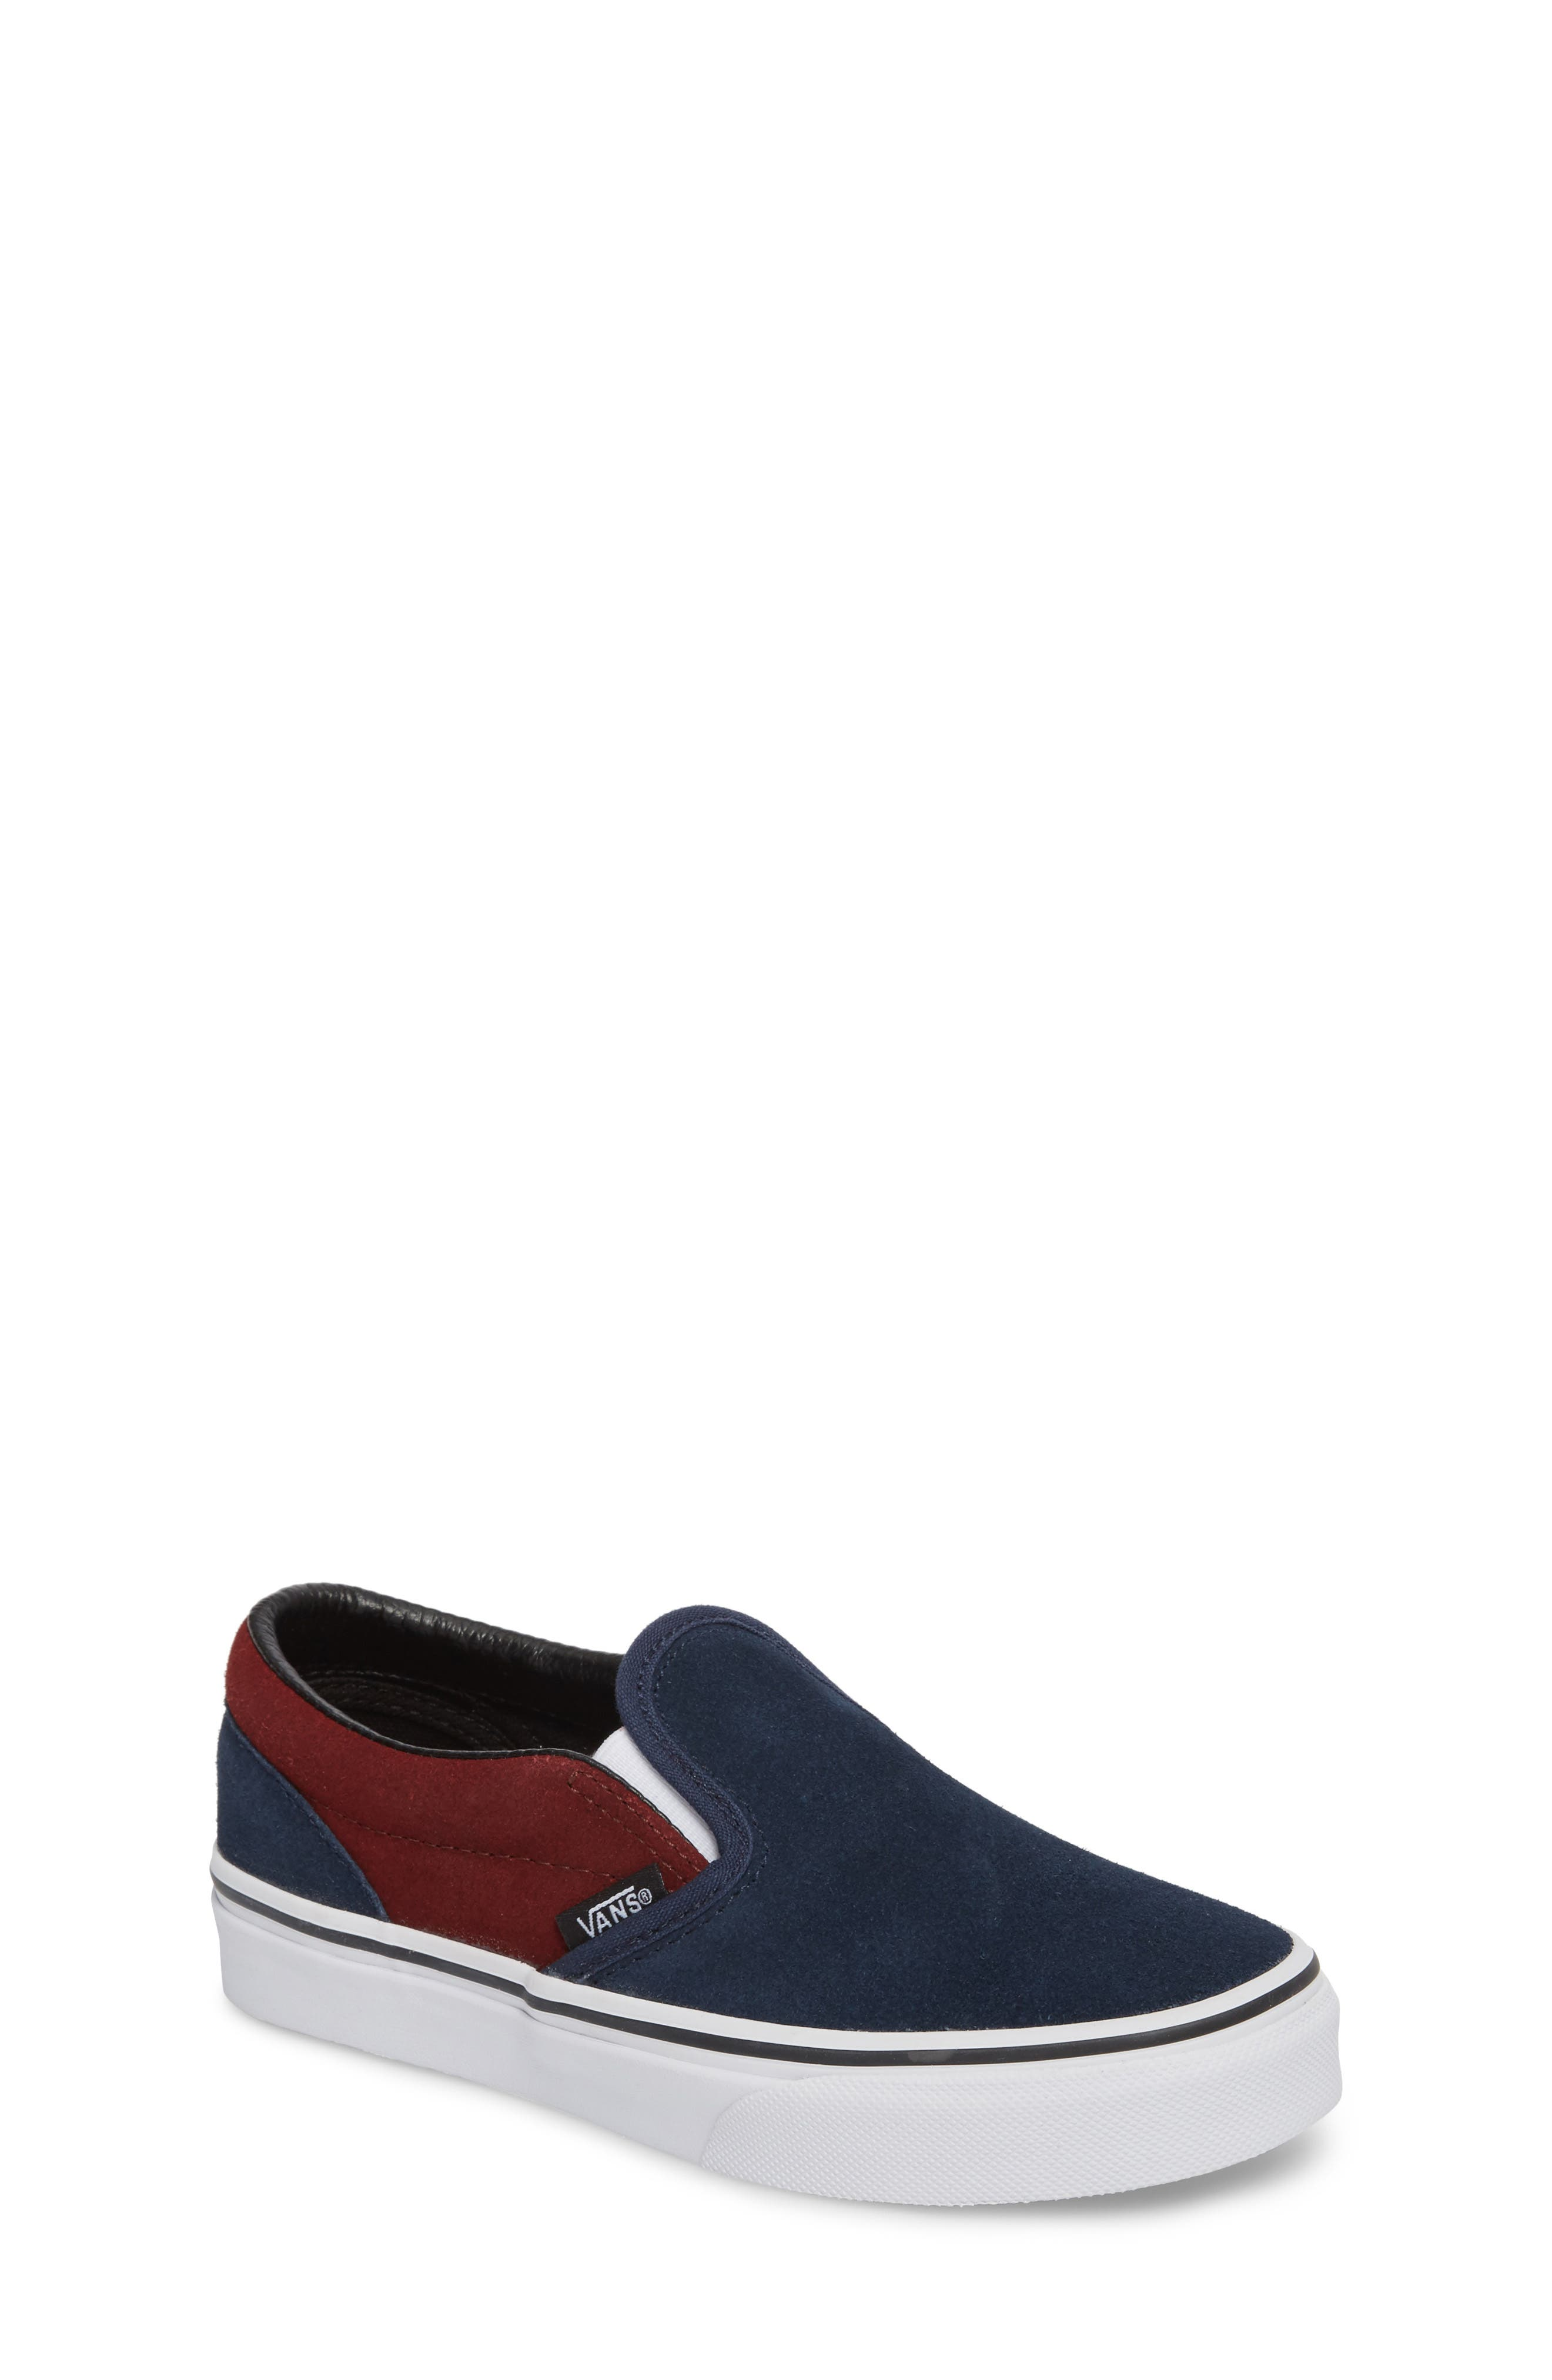 Classic Slip-On Sneaker,                             Main thumbnail 1, color,                             401